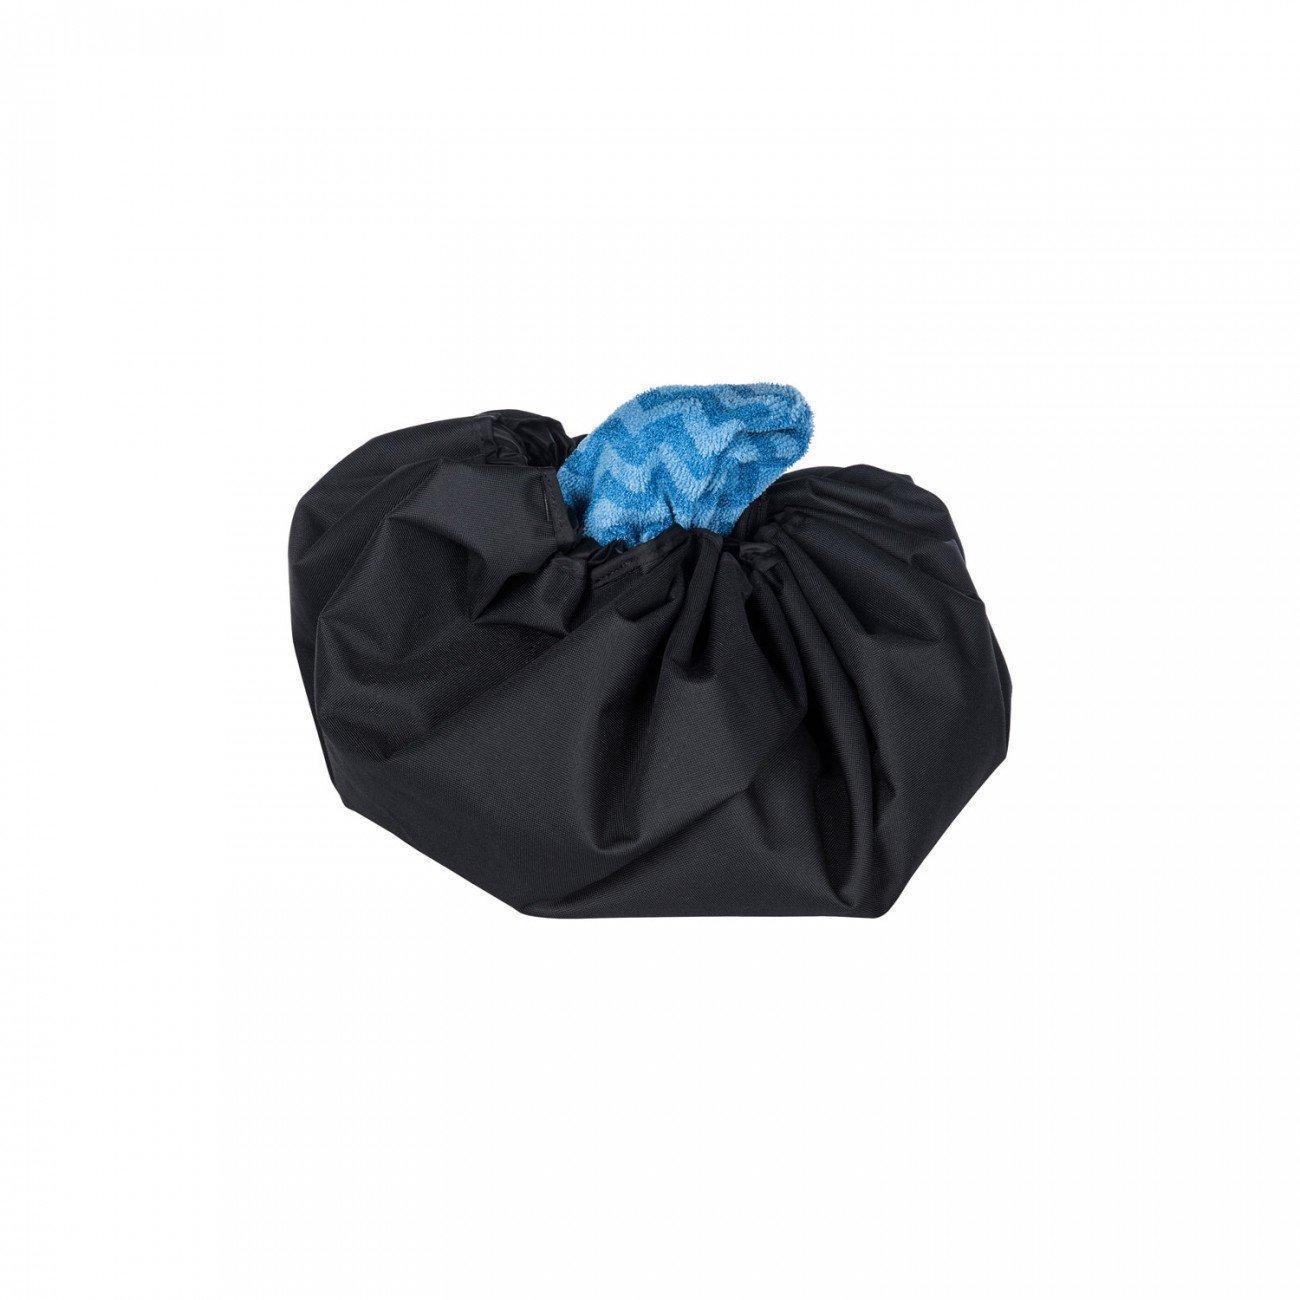 Wetsuit Bag 防水ウェットスーツバッグ